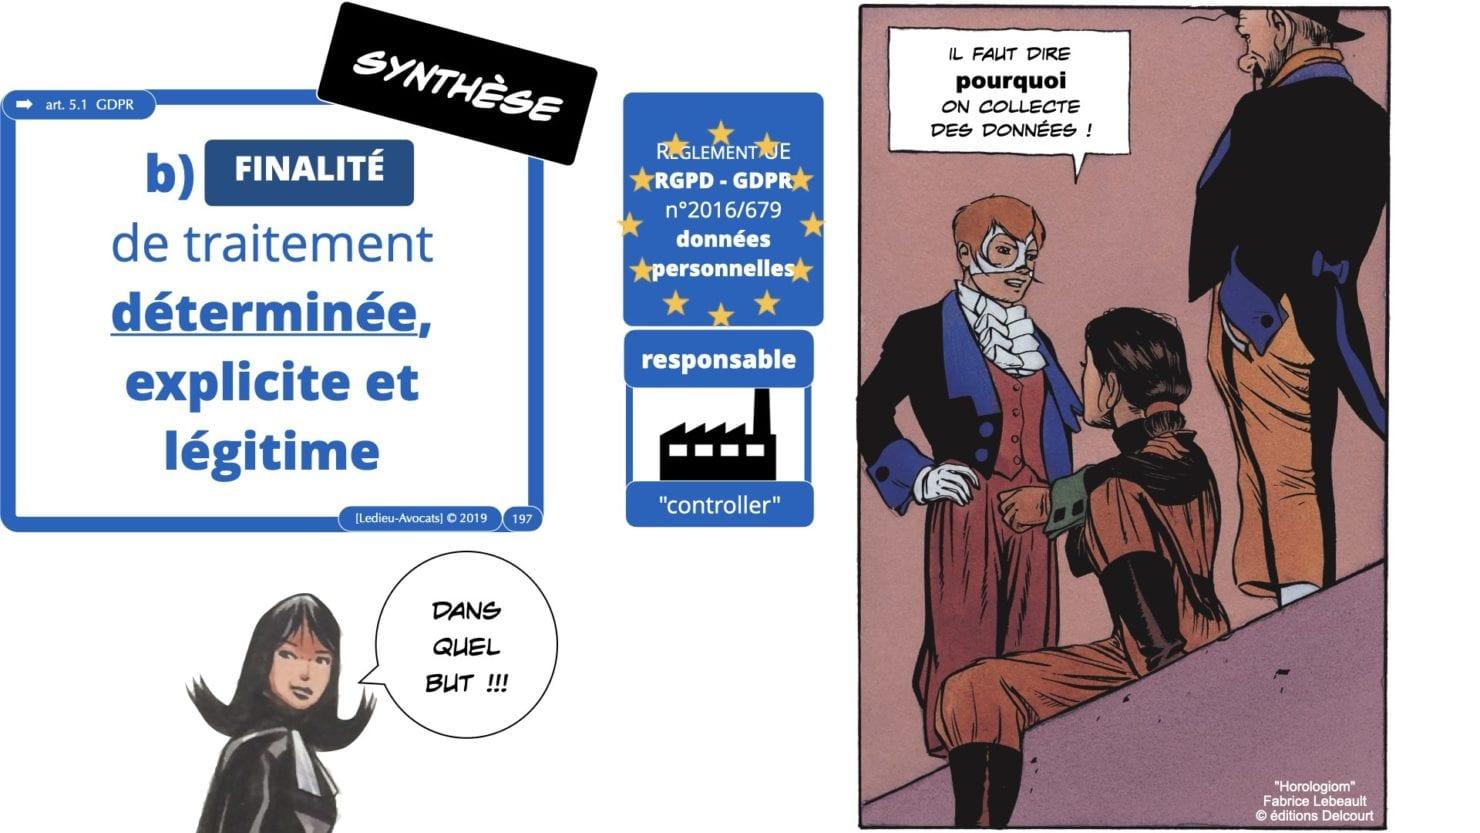 RGPD e-Privacy principes actualité jurisprudence ©Ledieu-Avocats 25-06-2021.197